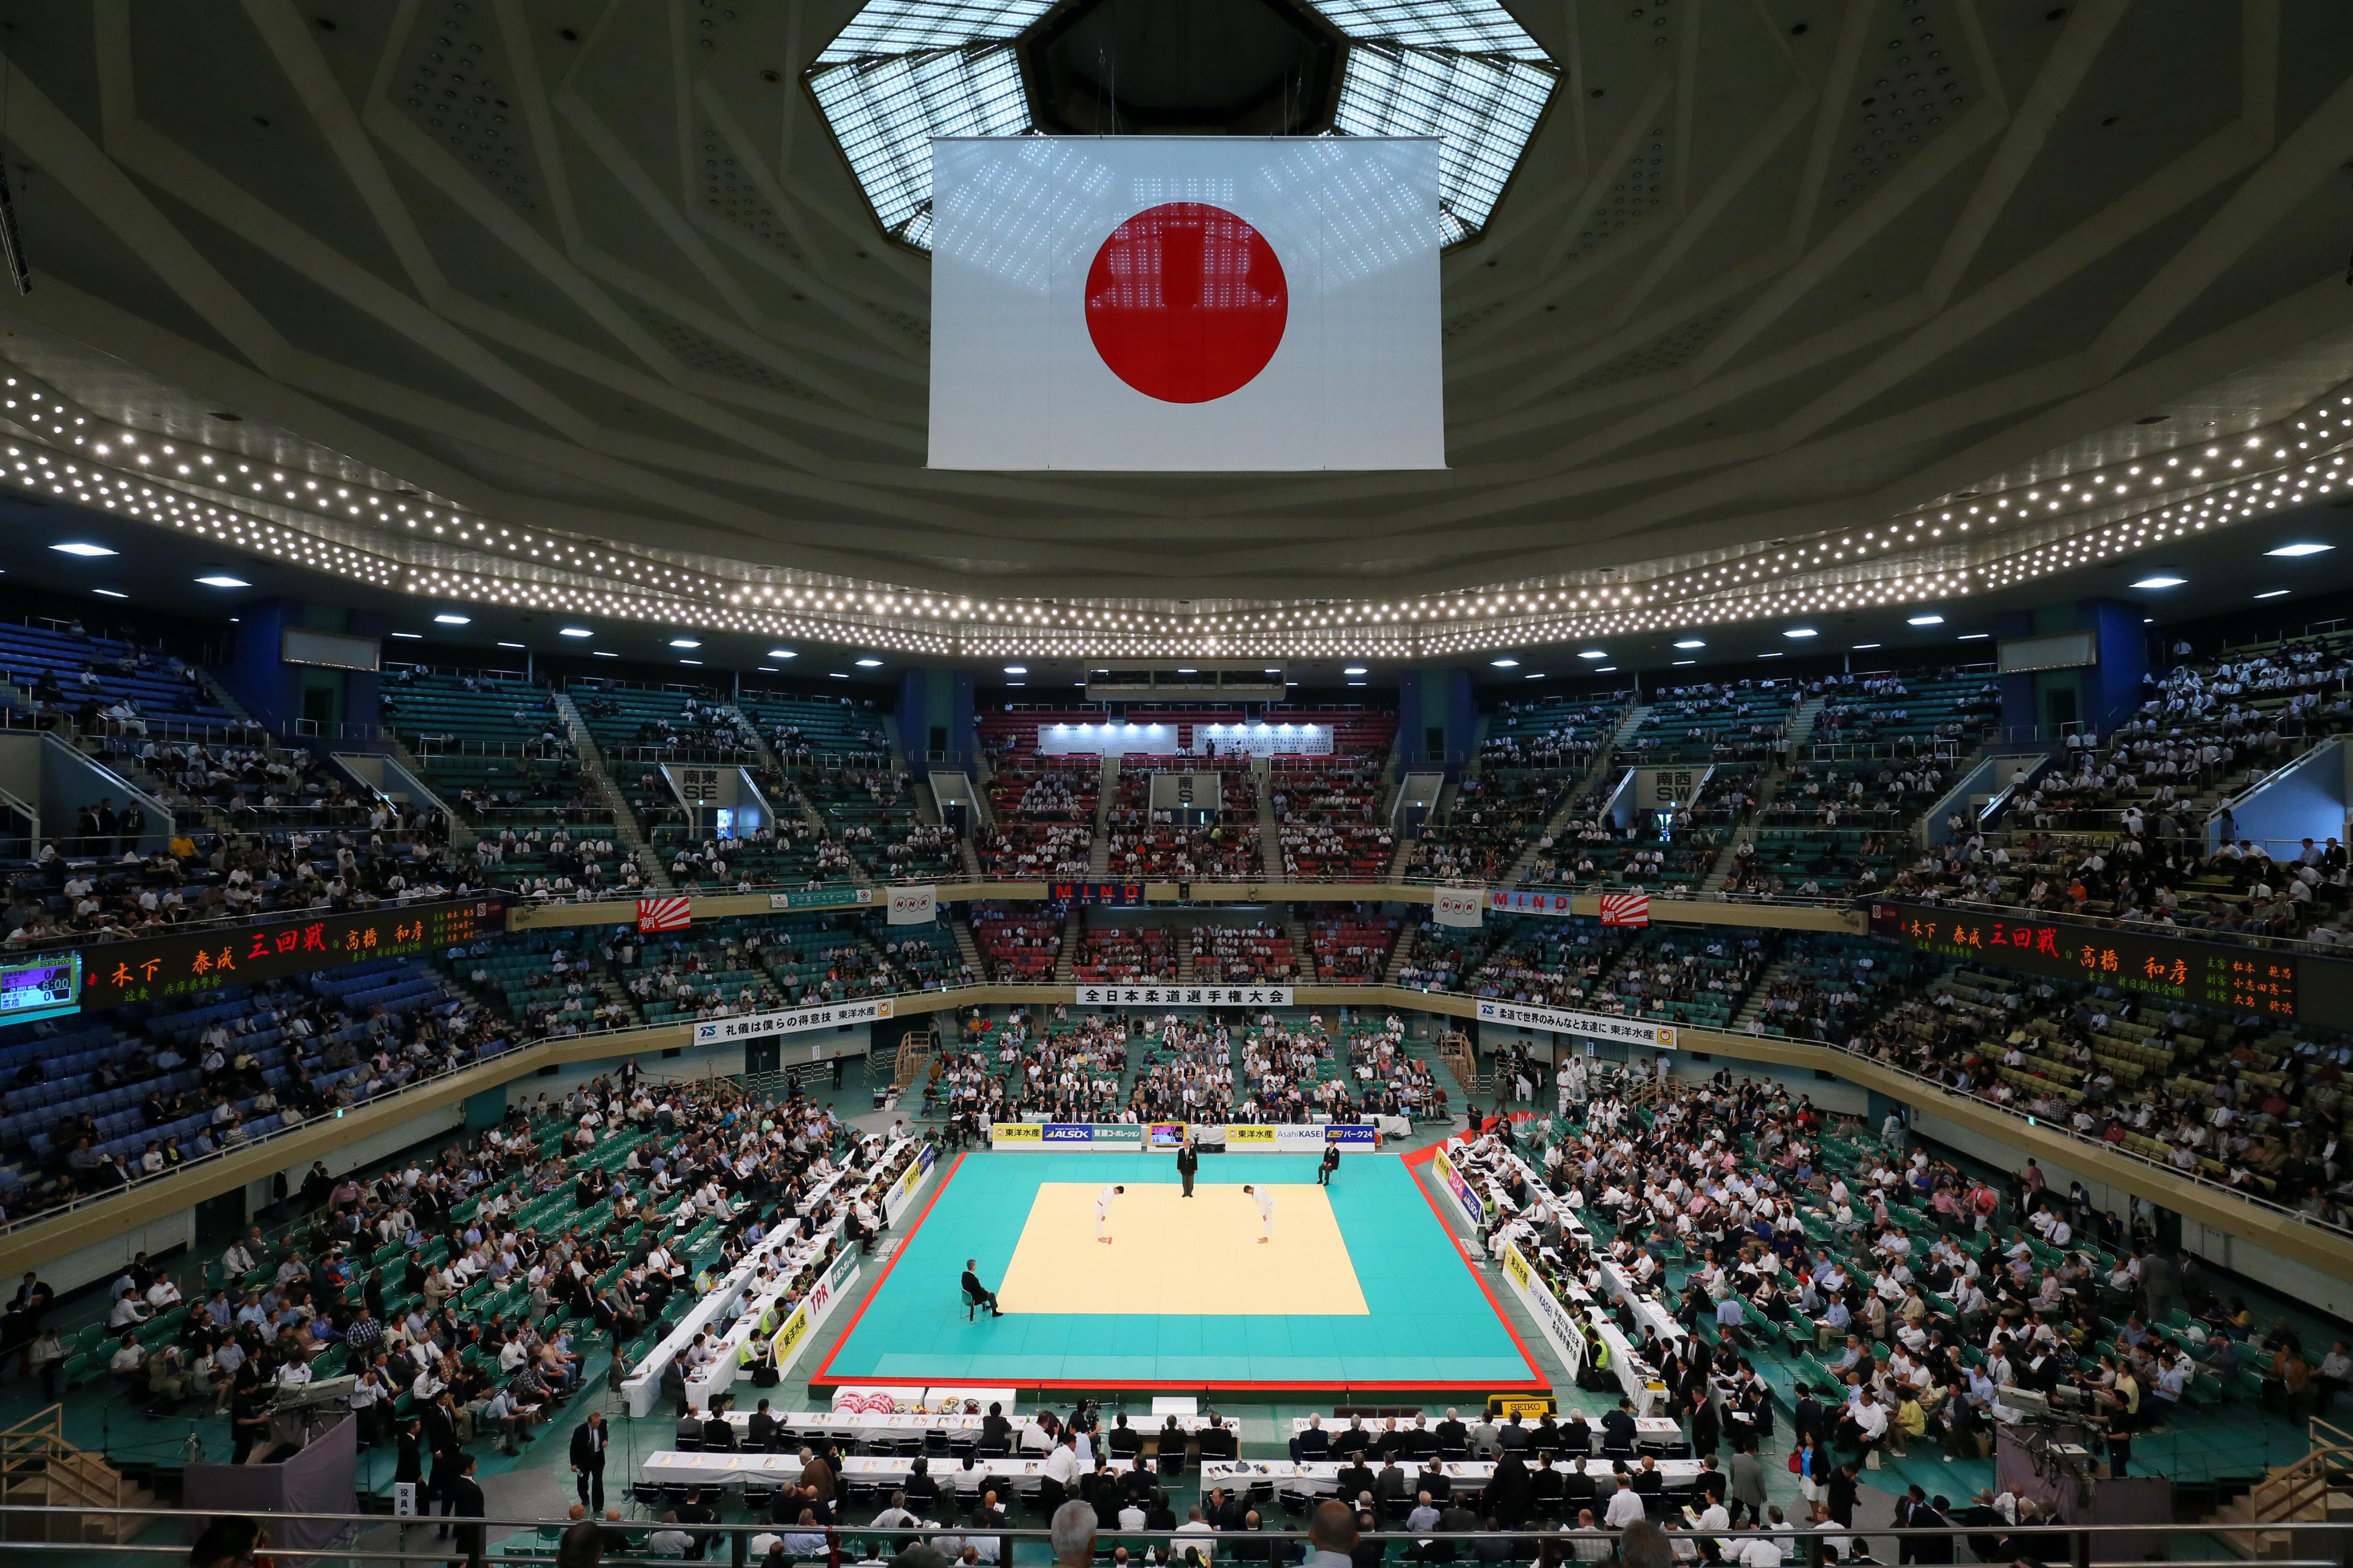 Nippon Budokan, Tokyo, Japan. 29th Apr, 2015. General view, APRIL 29, 2015 - Judo : 2015 All Japan Judo Championships at Nippon Budokan, Tokyo, Japan. © Yohei Osada/AFLO SPORT/Alamy Live News